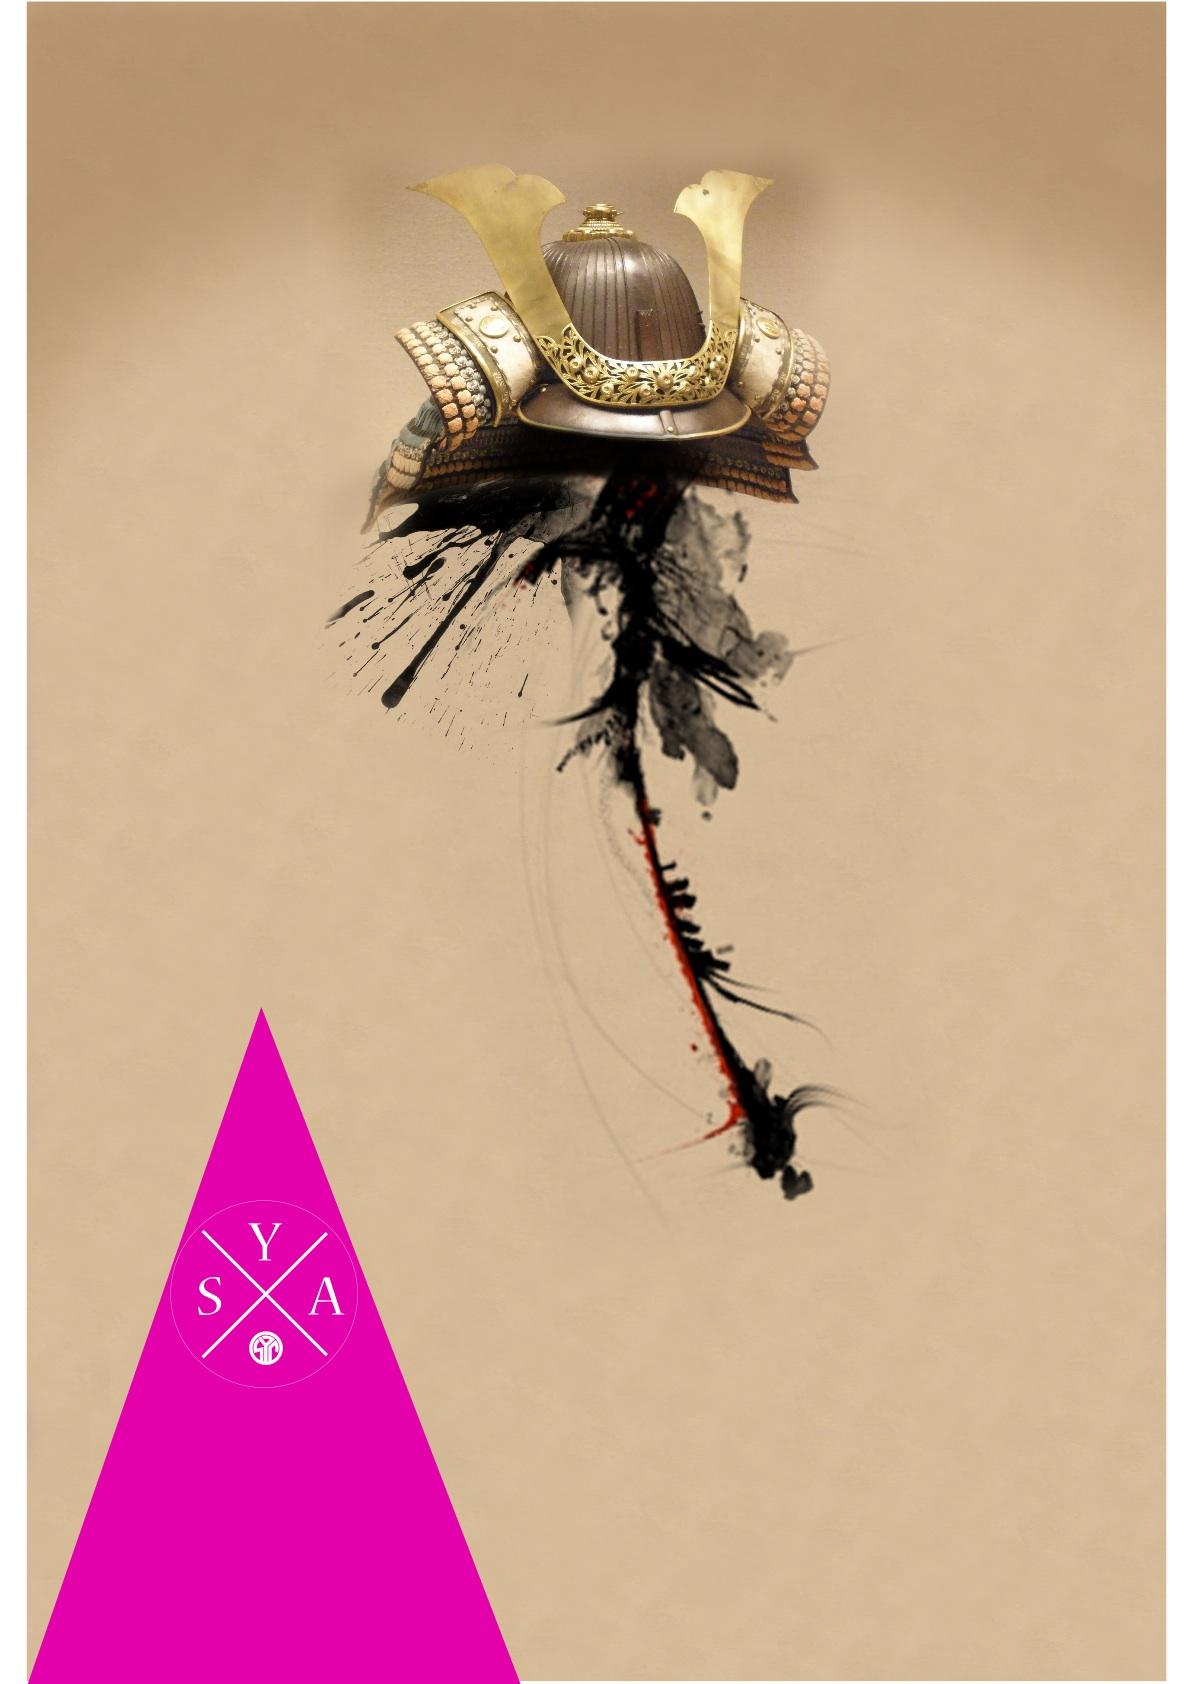 Oberon -numerique 2014 sya casque samourai.jpg